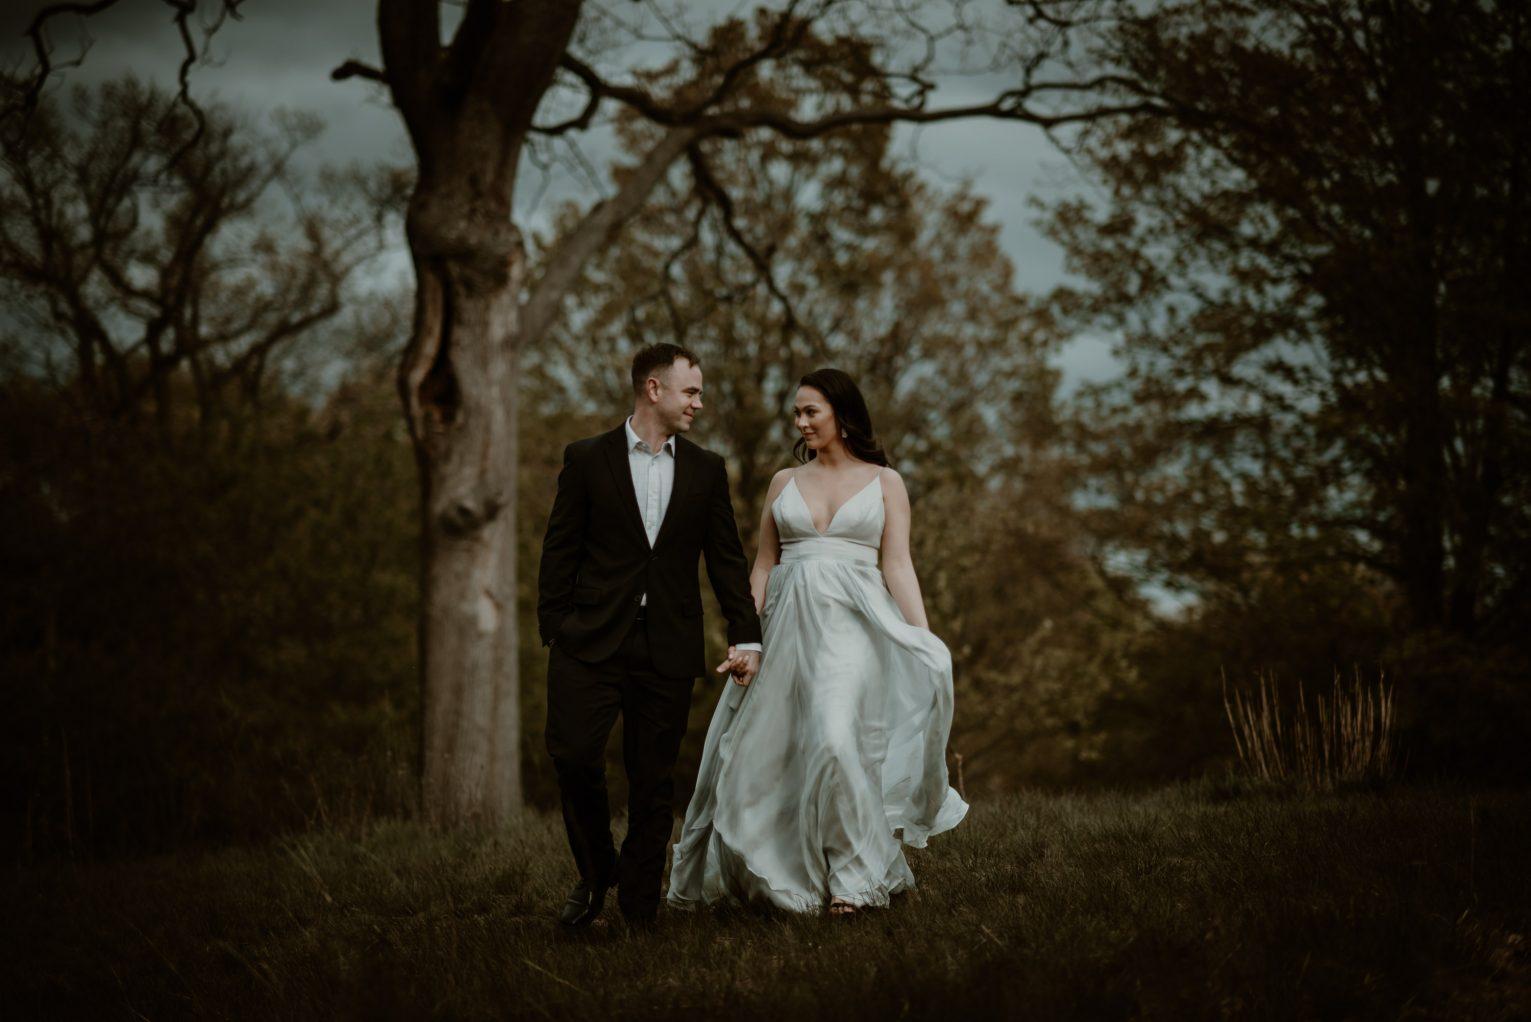 Michigan wedding- bride and groom walking by trees